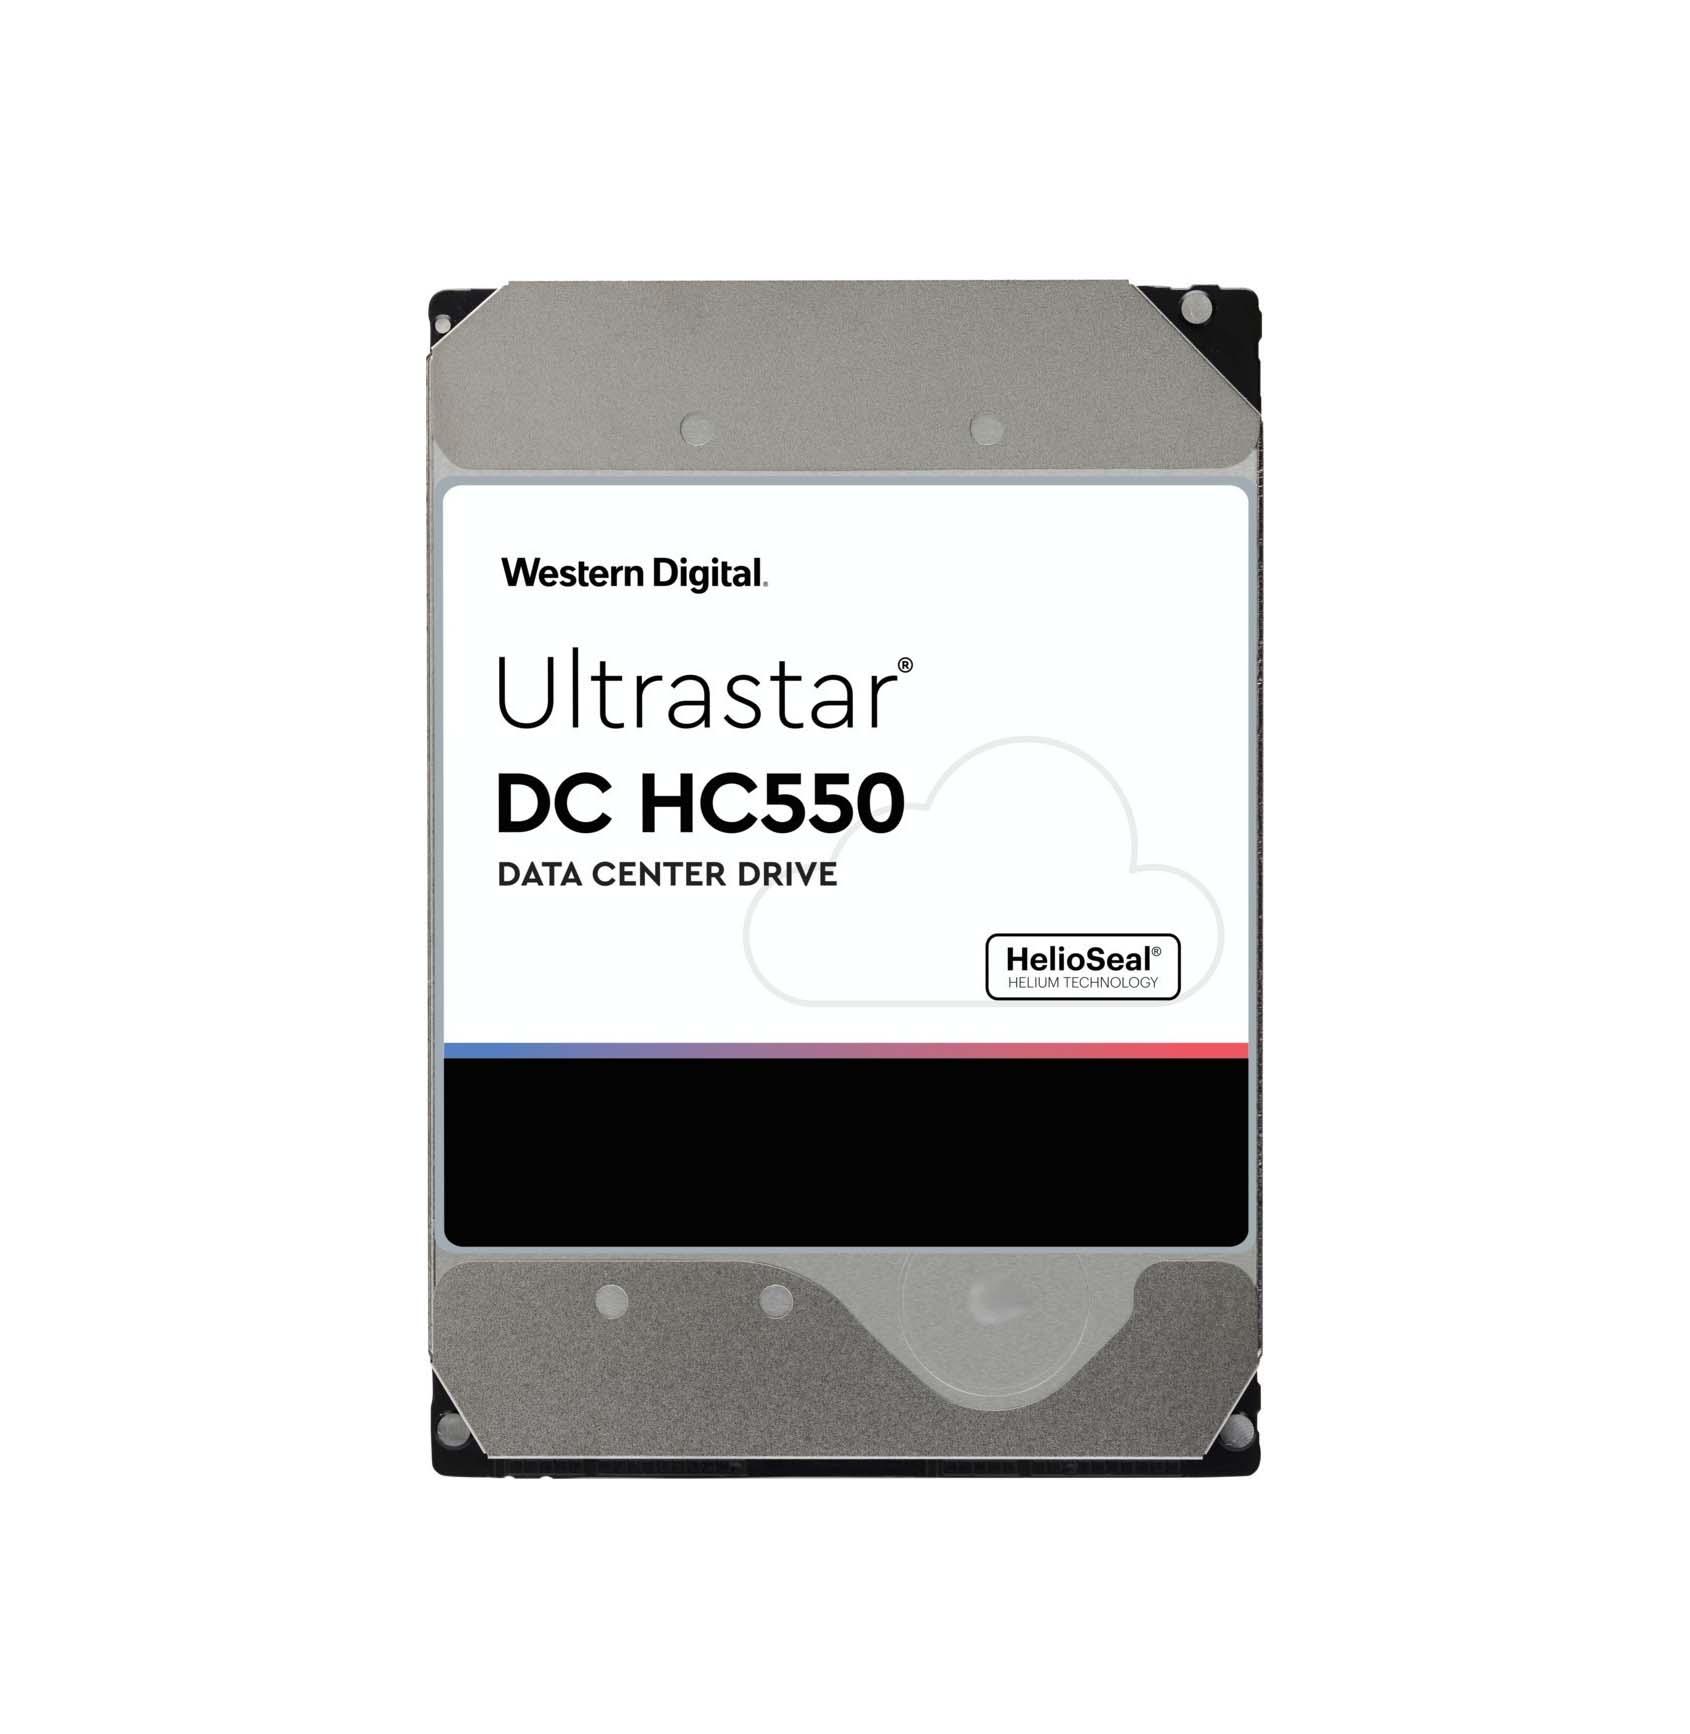 Western Digital Ultrastar DC HC550 (SE) 18TB WUH721818ALE6L4 Σκληρός Δίσκος* 3.5'' Sata 3